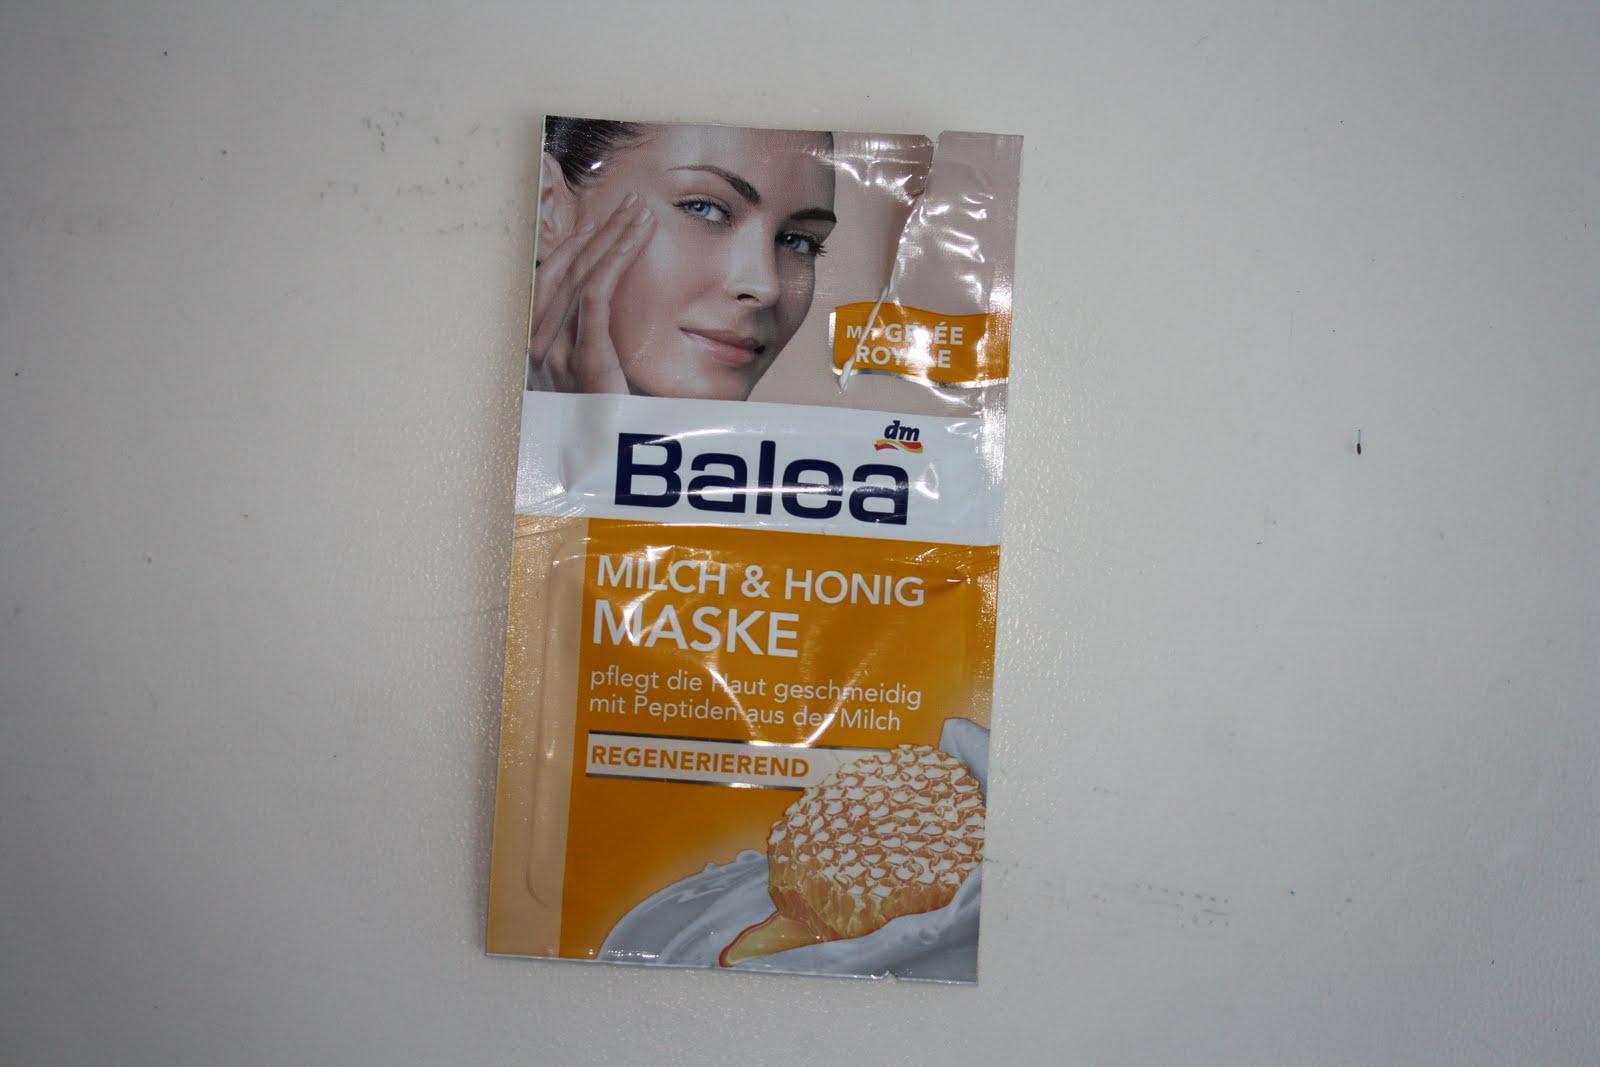 feed your life review balea milch honig maske. Black Bedroom Furniture Sets. Home Design Ideas